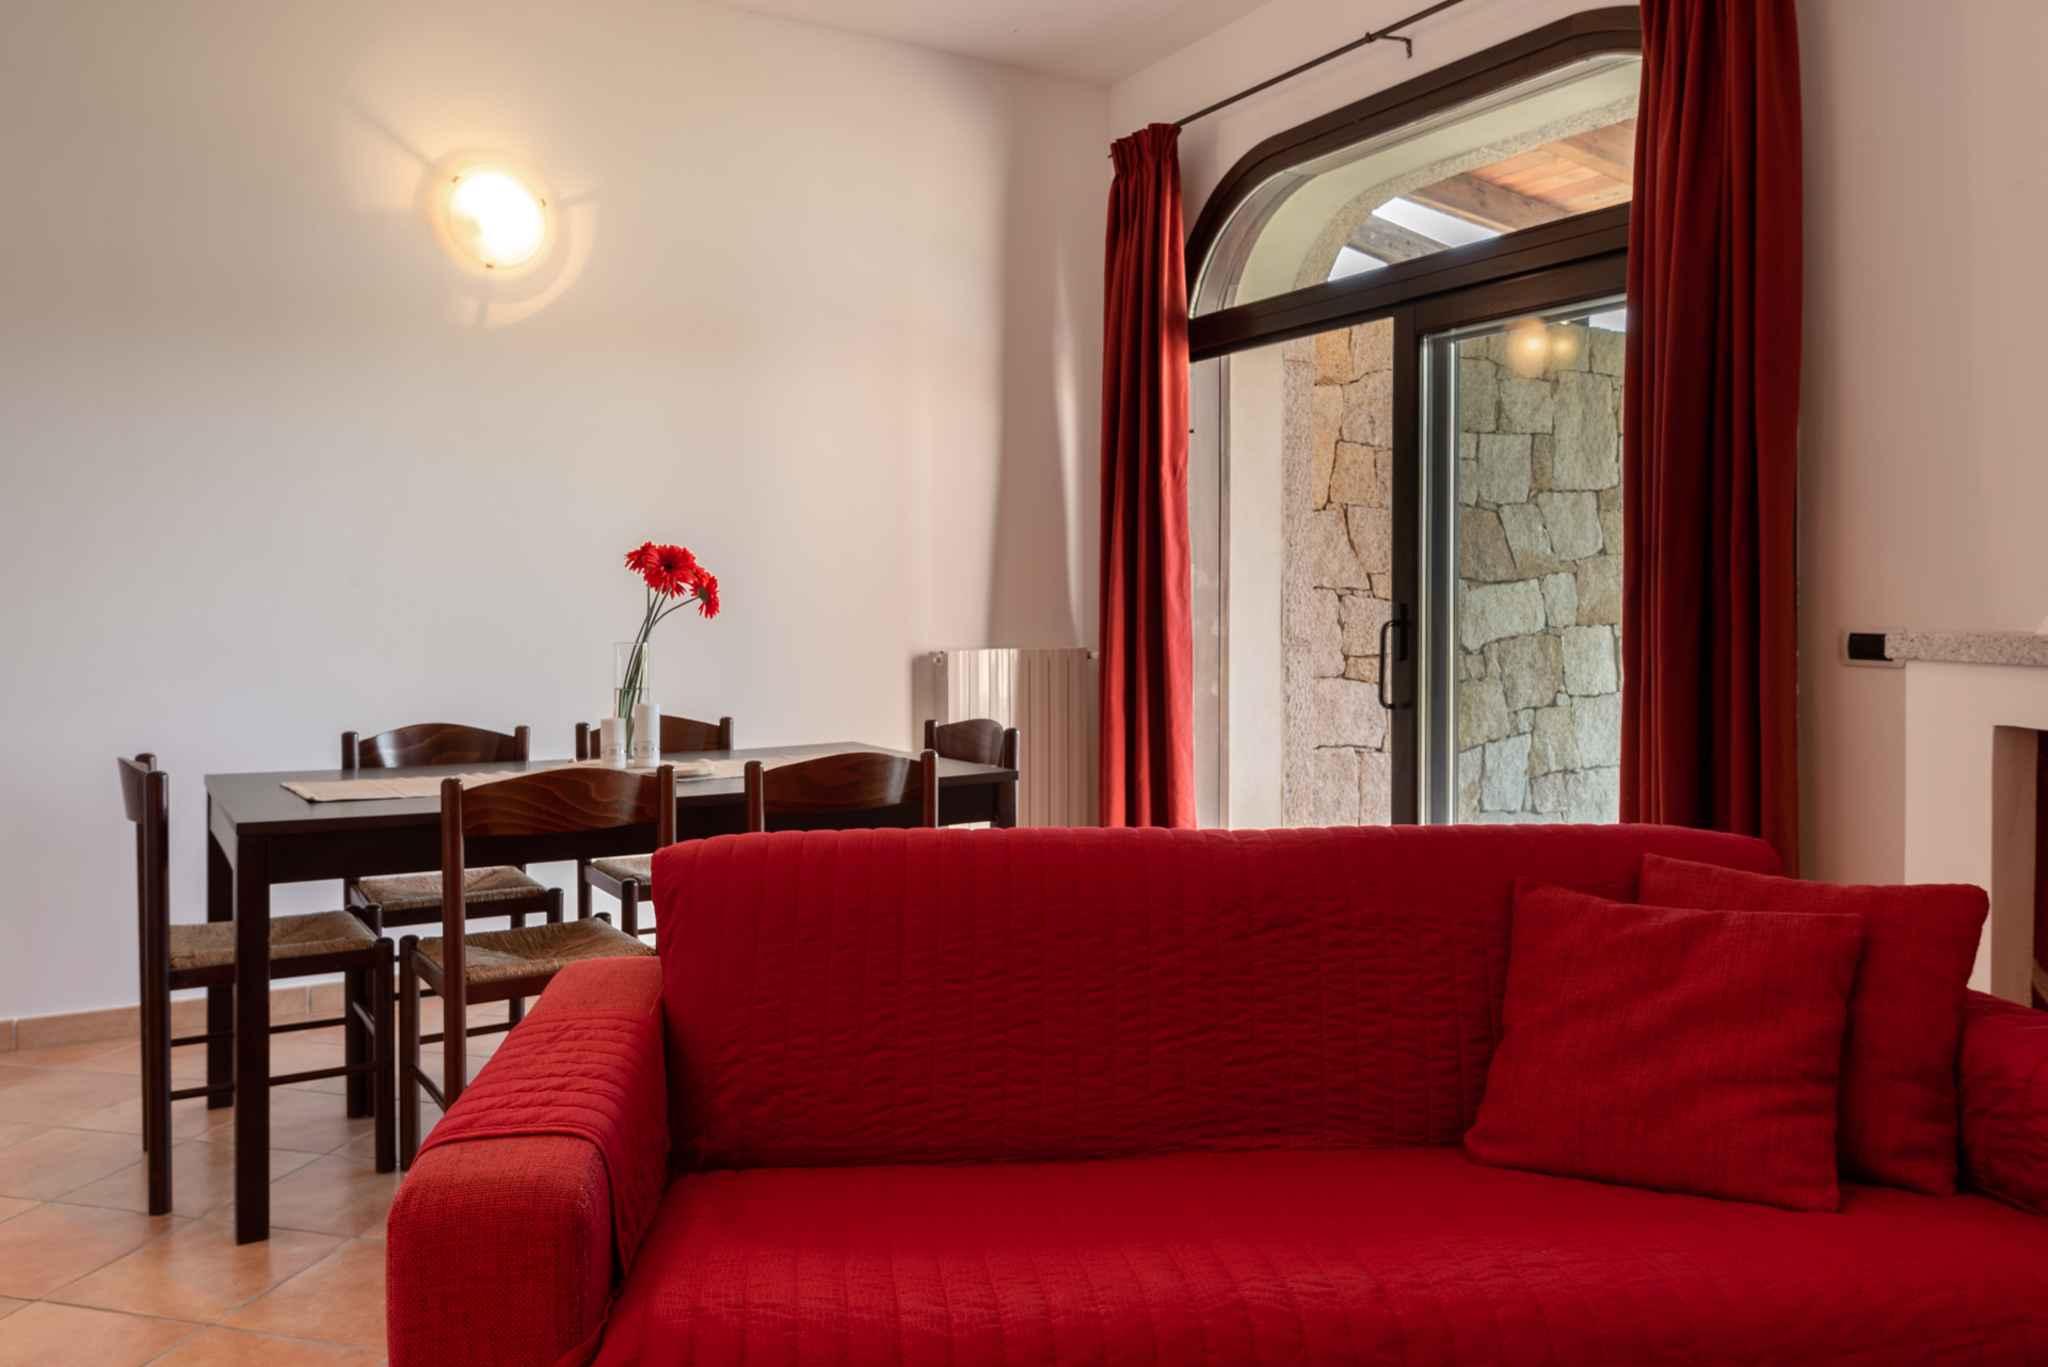 Ferienhaus con giardino (2182422), Alghero, Sassari, Sardinien, Italien, Bild 11